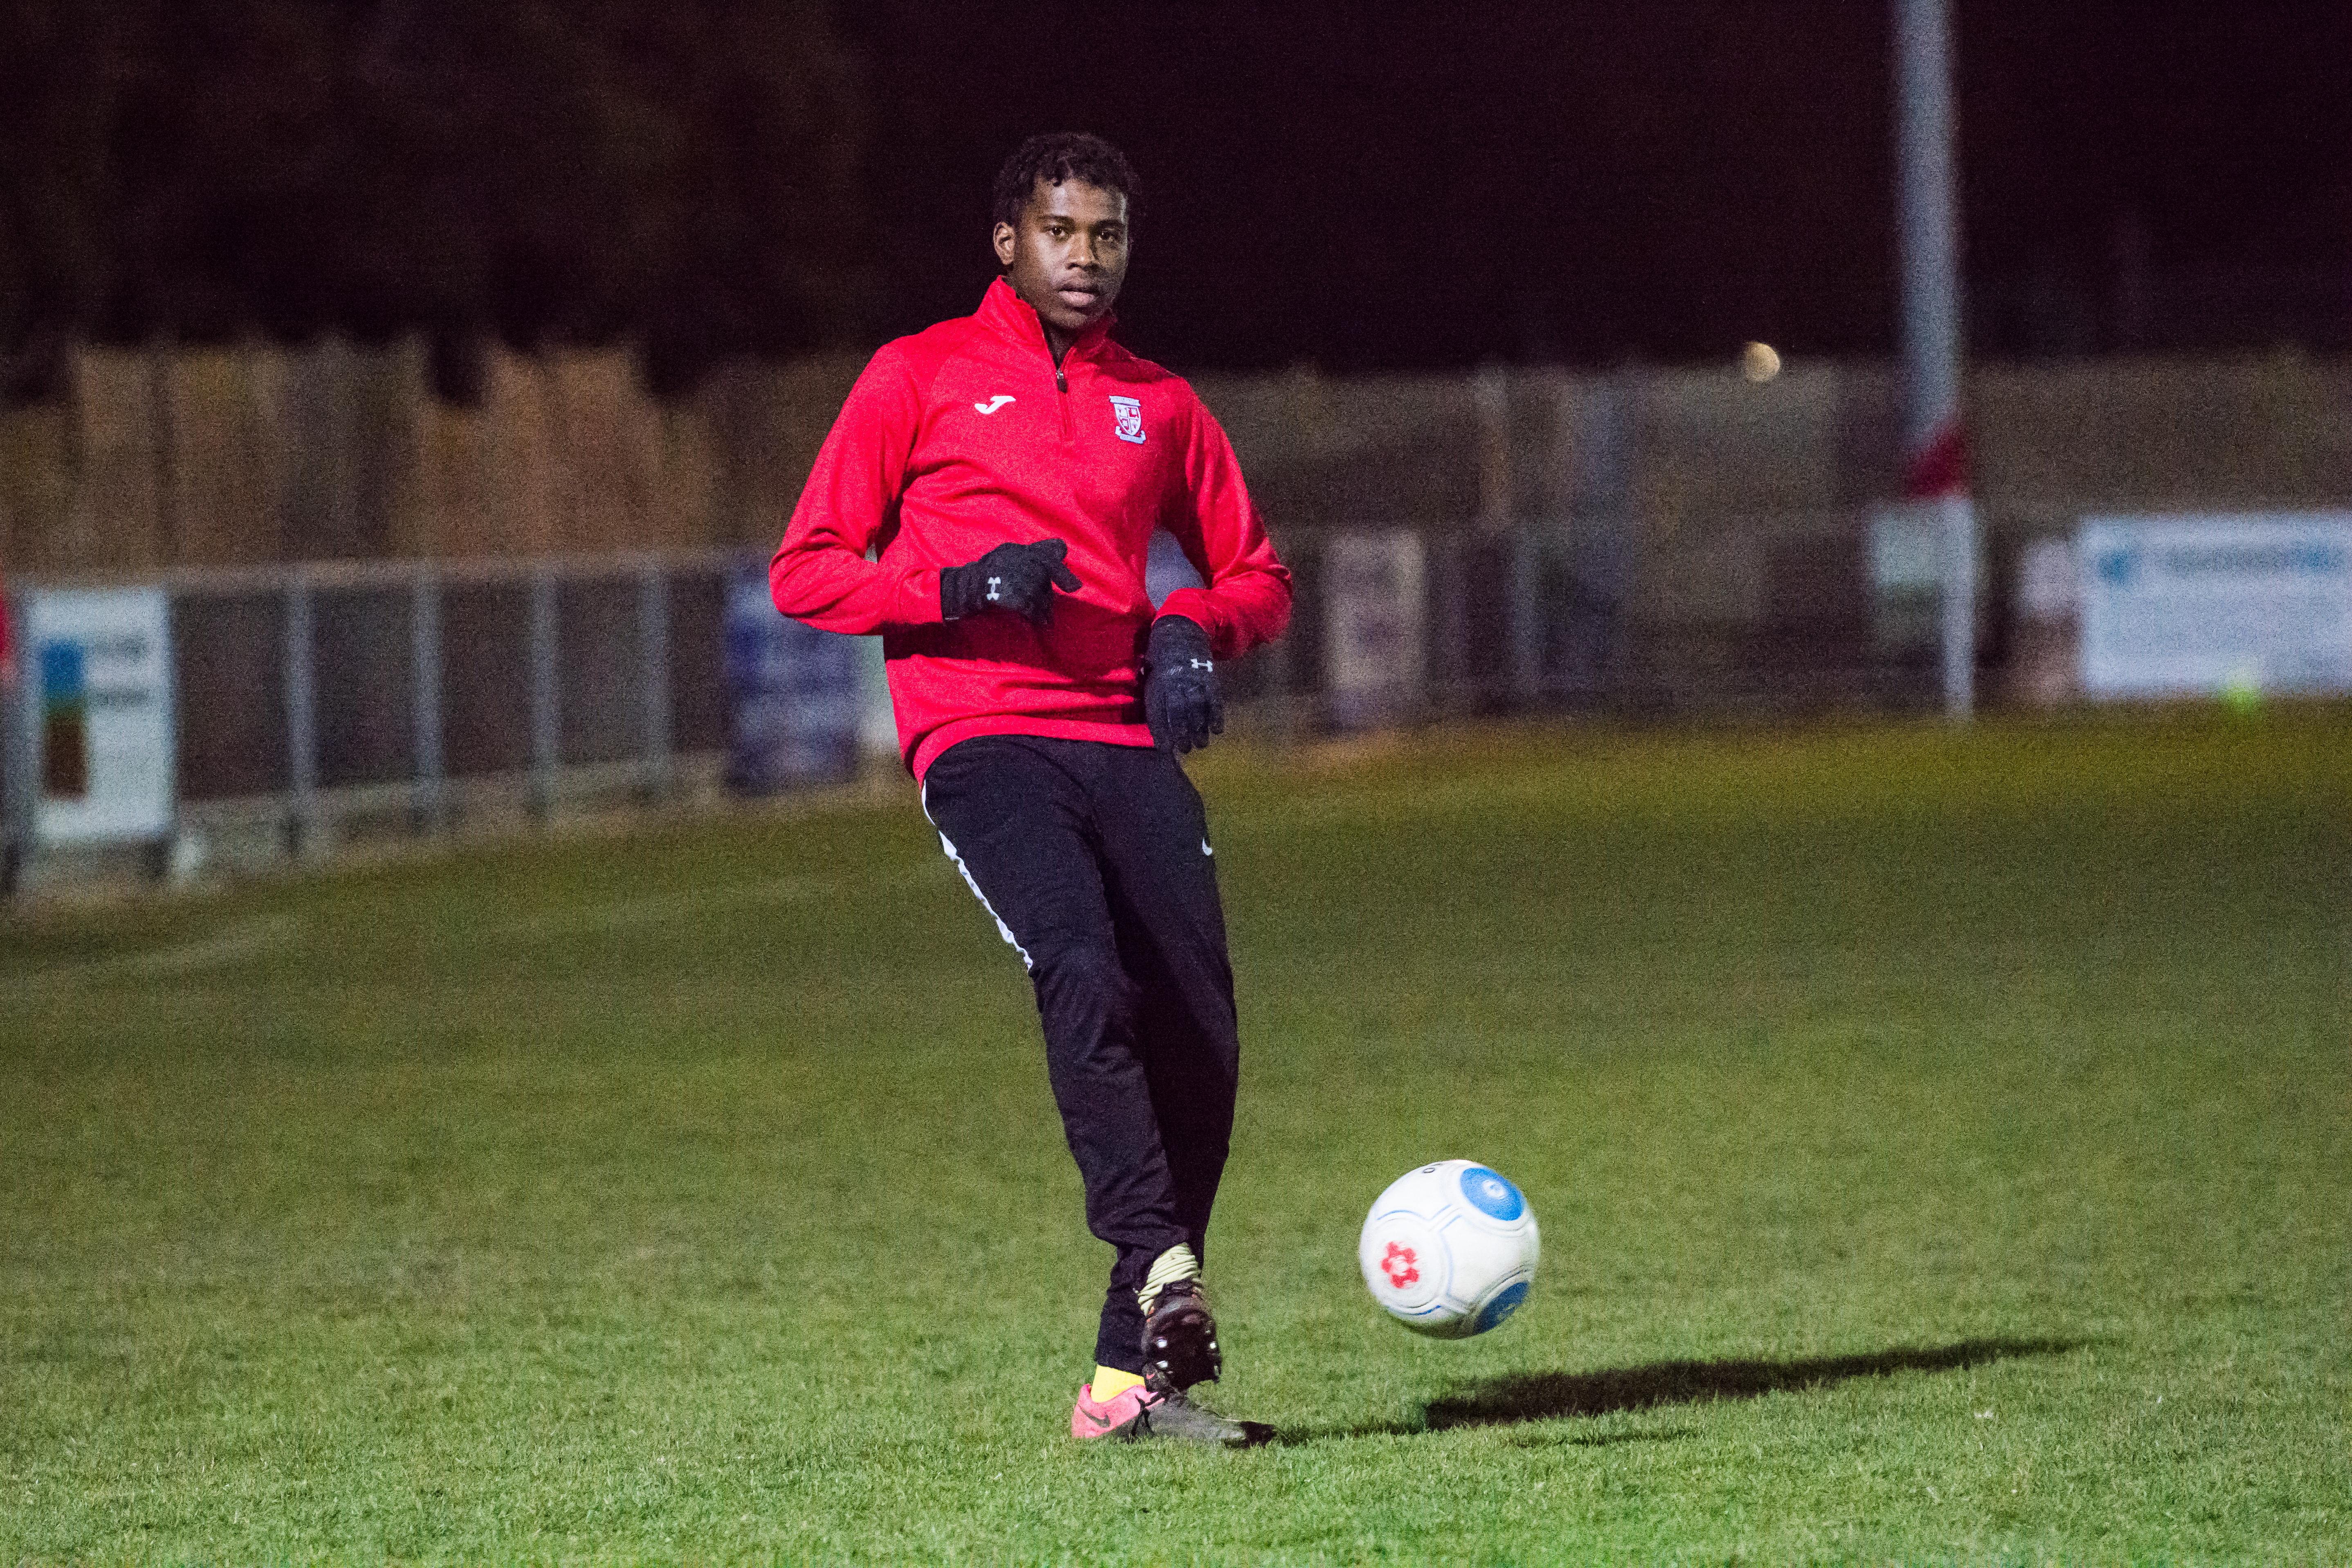 DAVID_JEFFERY Shoreham FC U18s vs Woking FC Academy 22.03.18 10